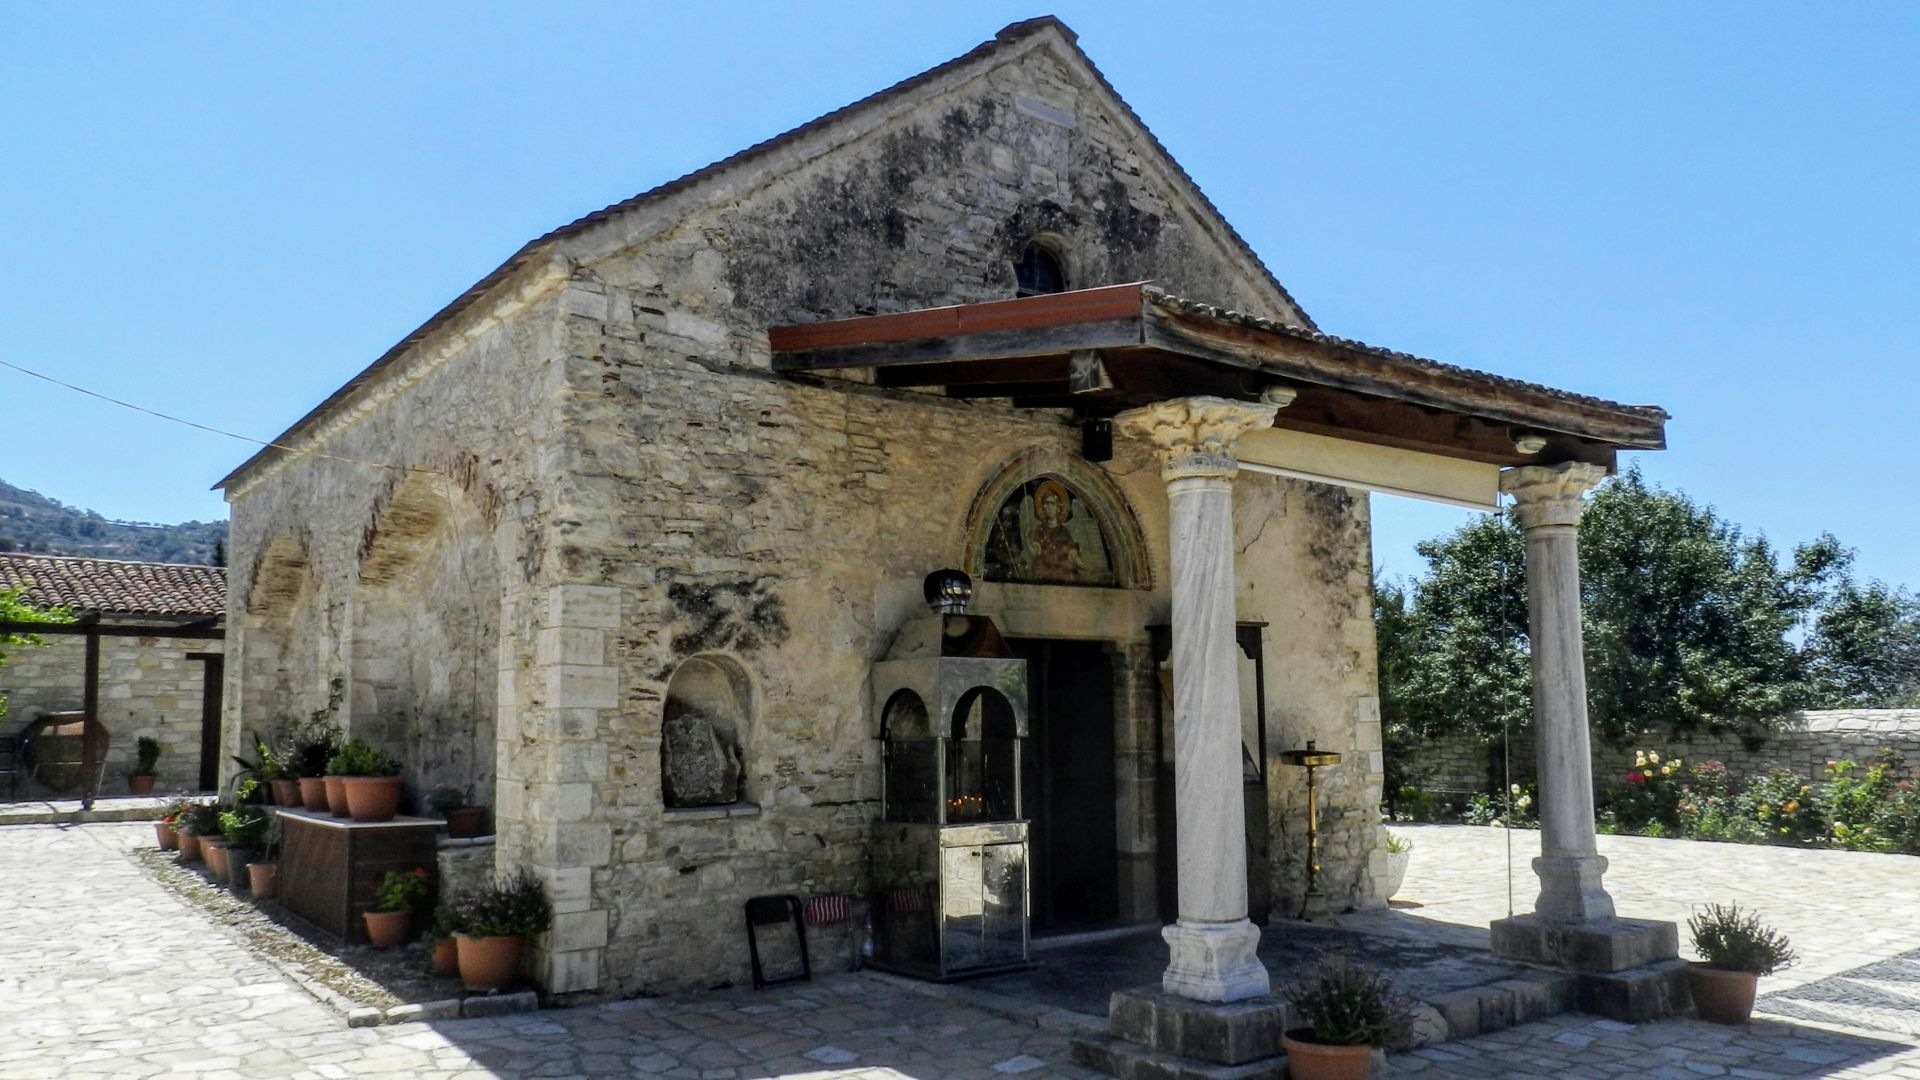 Cypr - Archangelos Michael Monastery